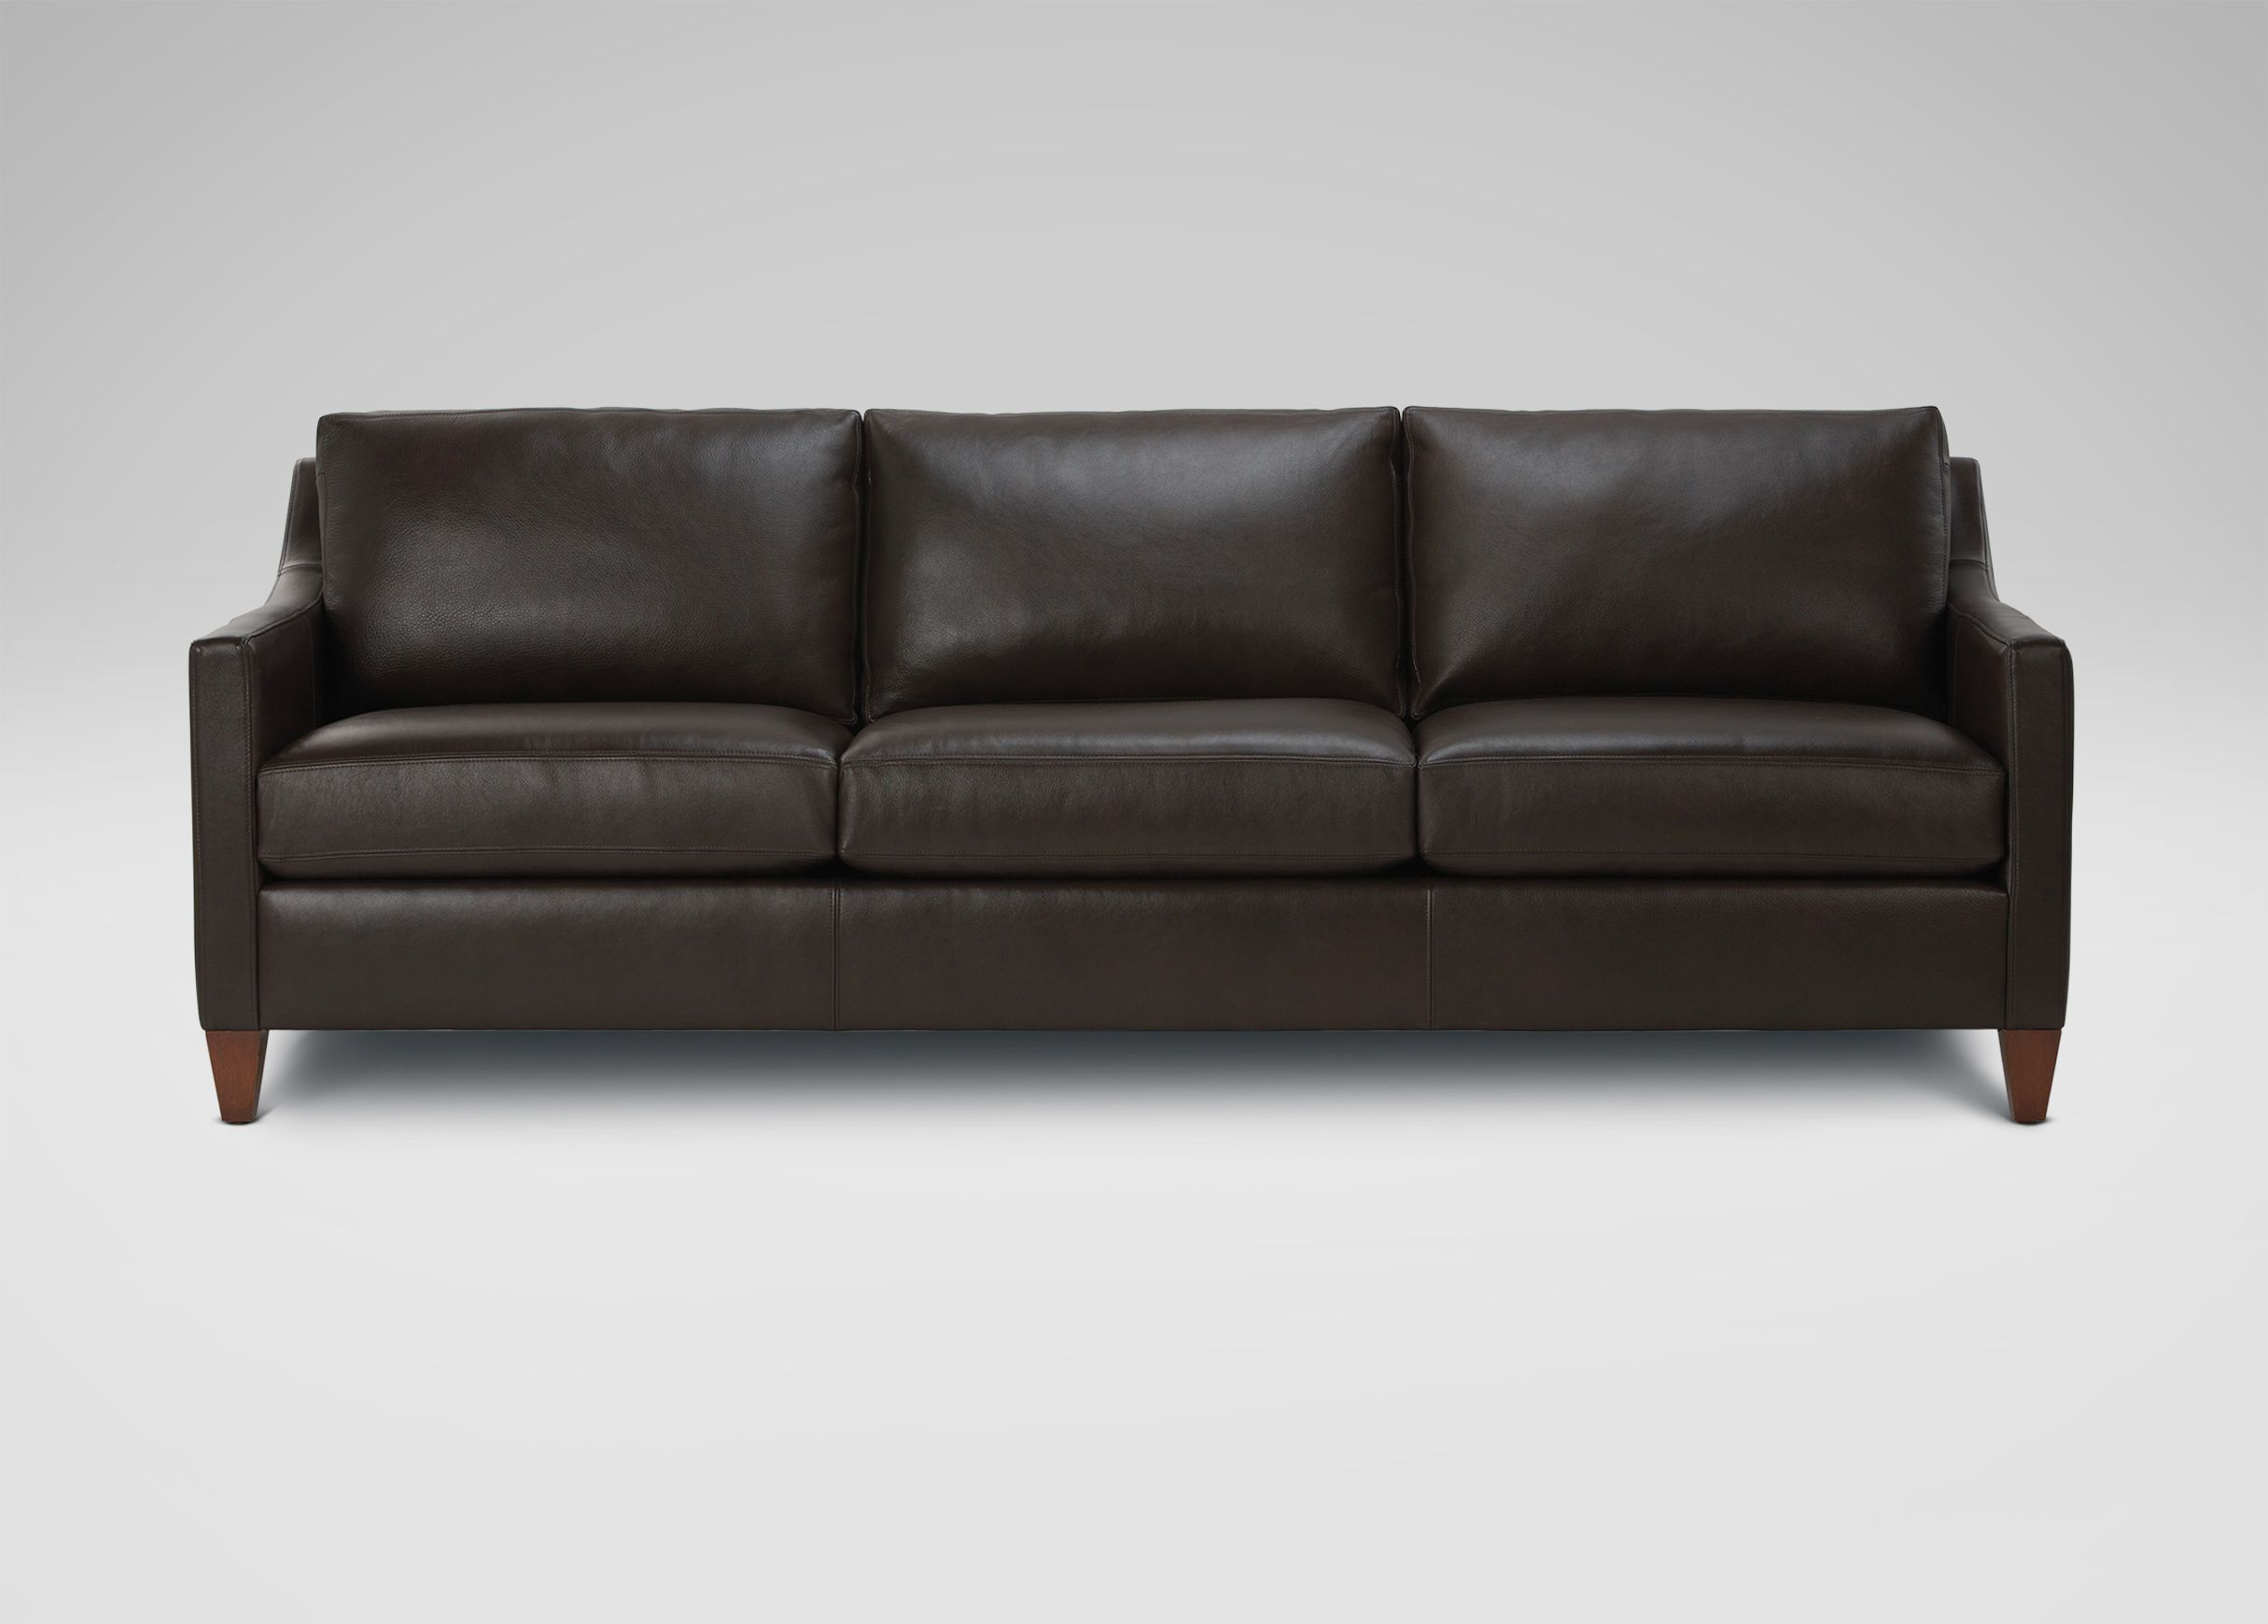 Monterey Three Cushion Leather Sofa Ethan Allen 2 639 20 94 W Leather Sofa Sofa Furniture